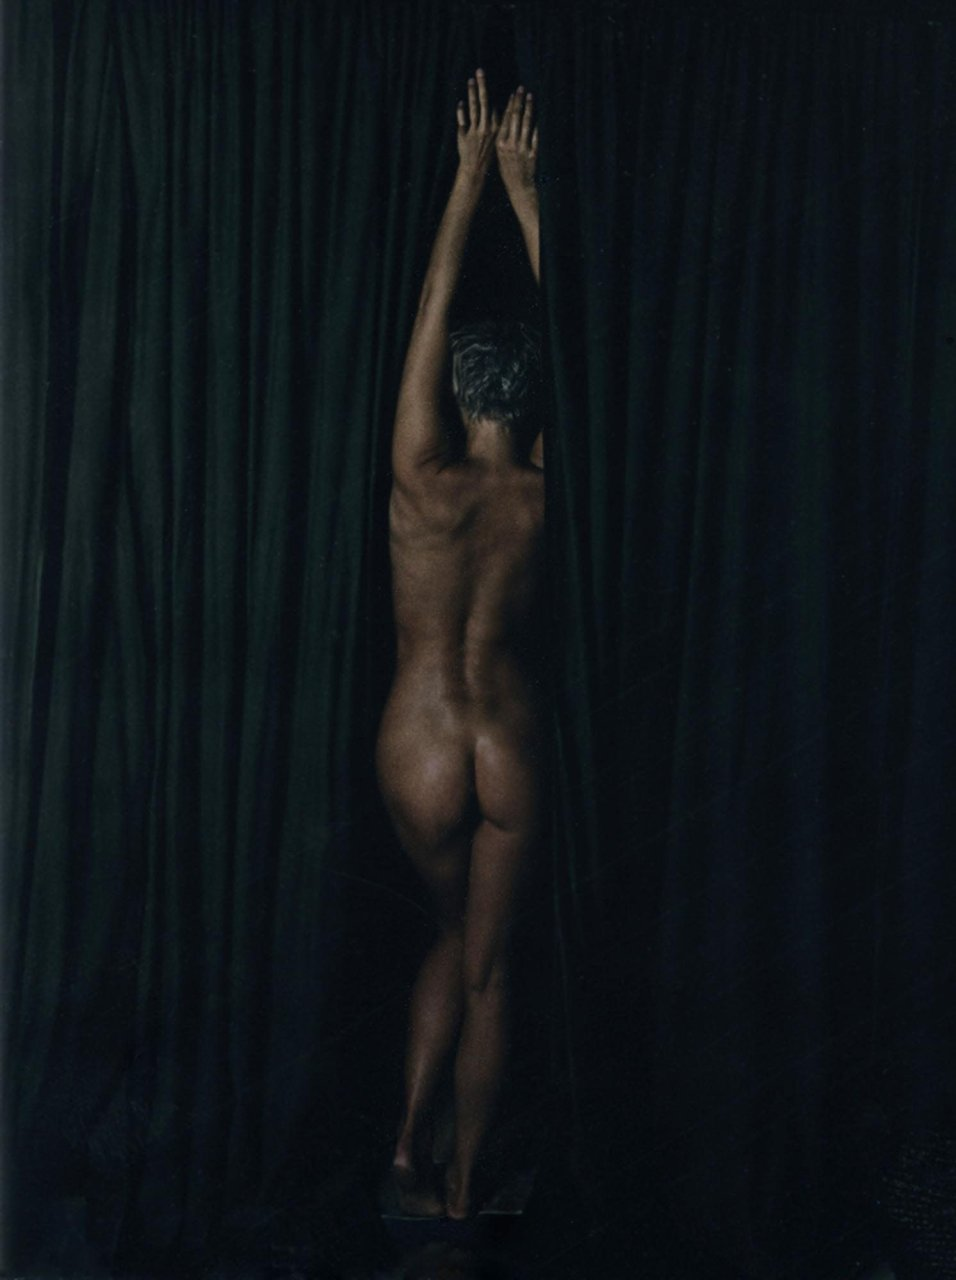 Marissa johnson erotica naked — pic 12